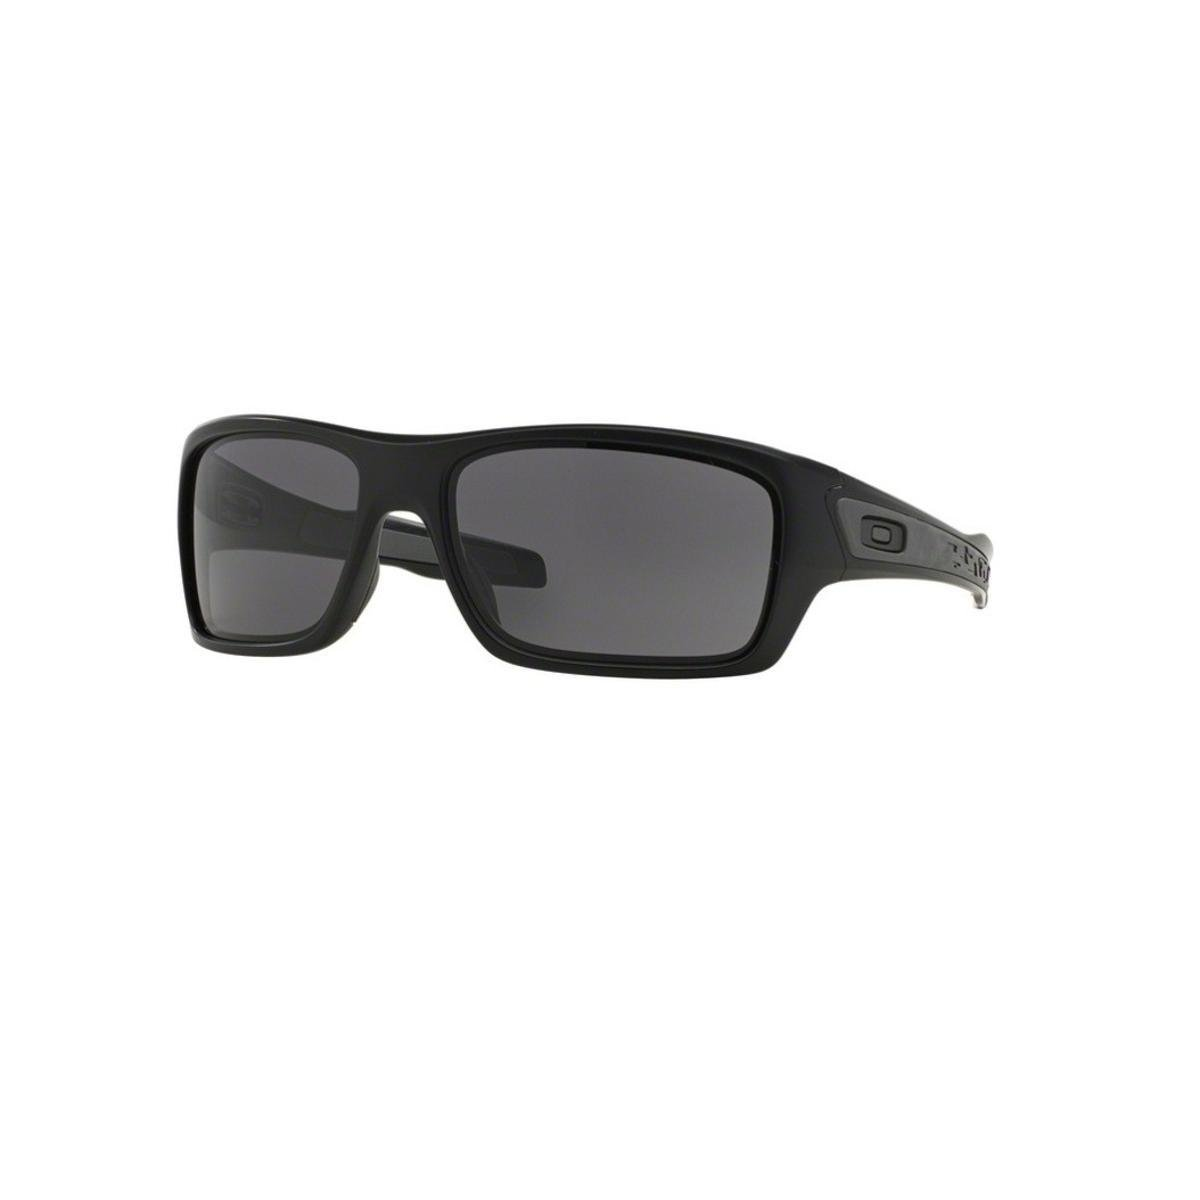 3b26ca502bf2d Óculos Oakley Turbine Warm - Cinza - Compre Agora   Zattini